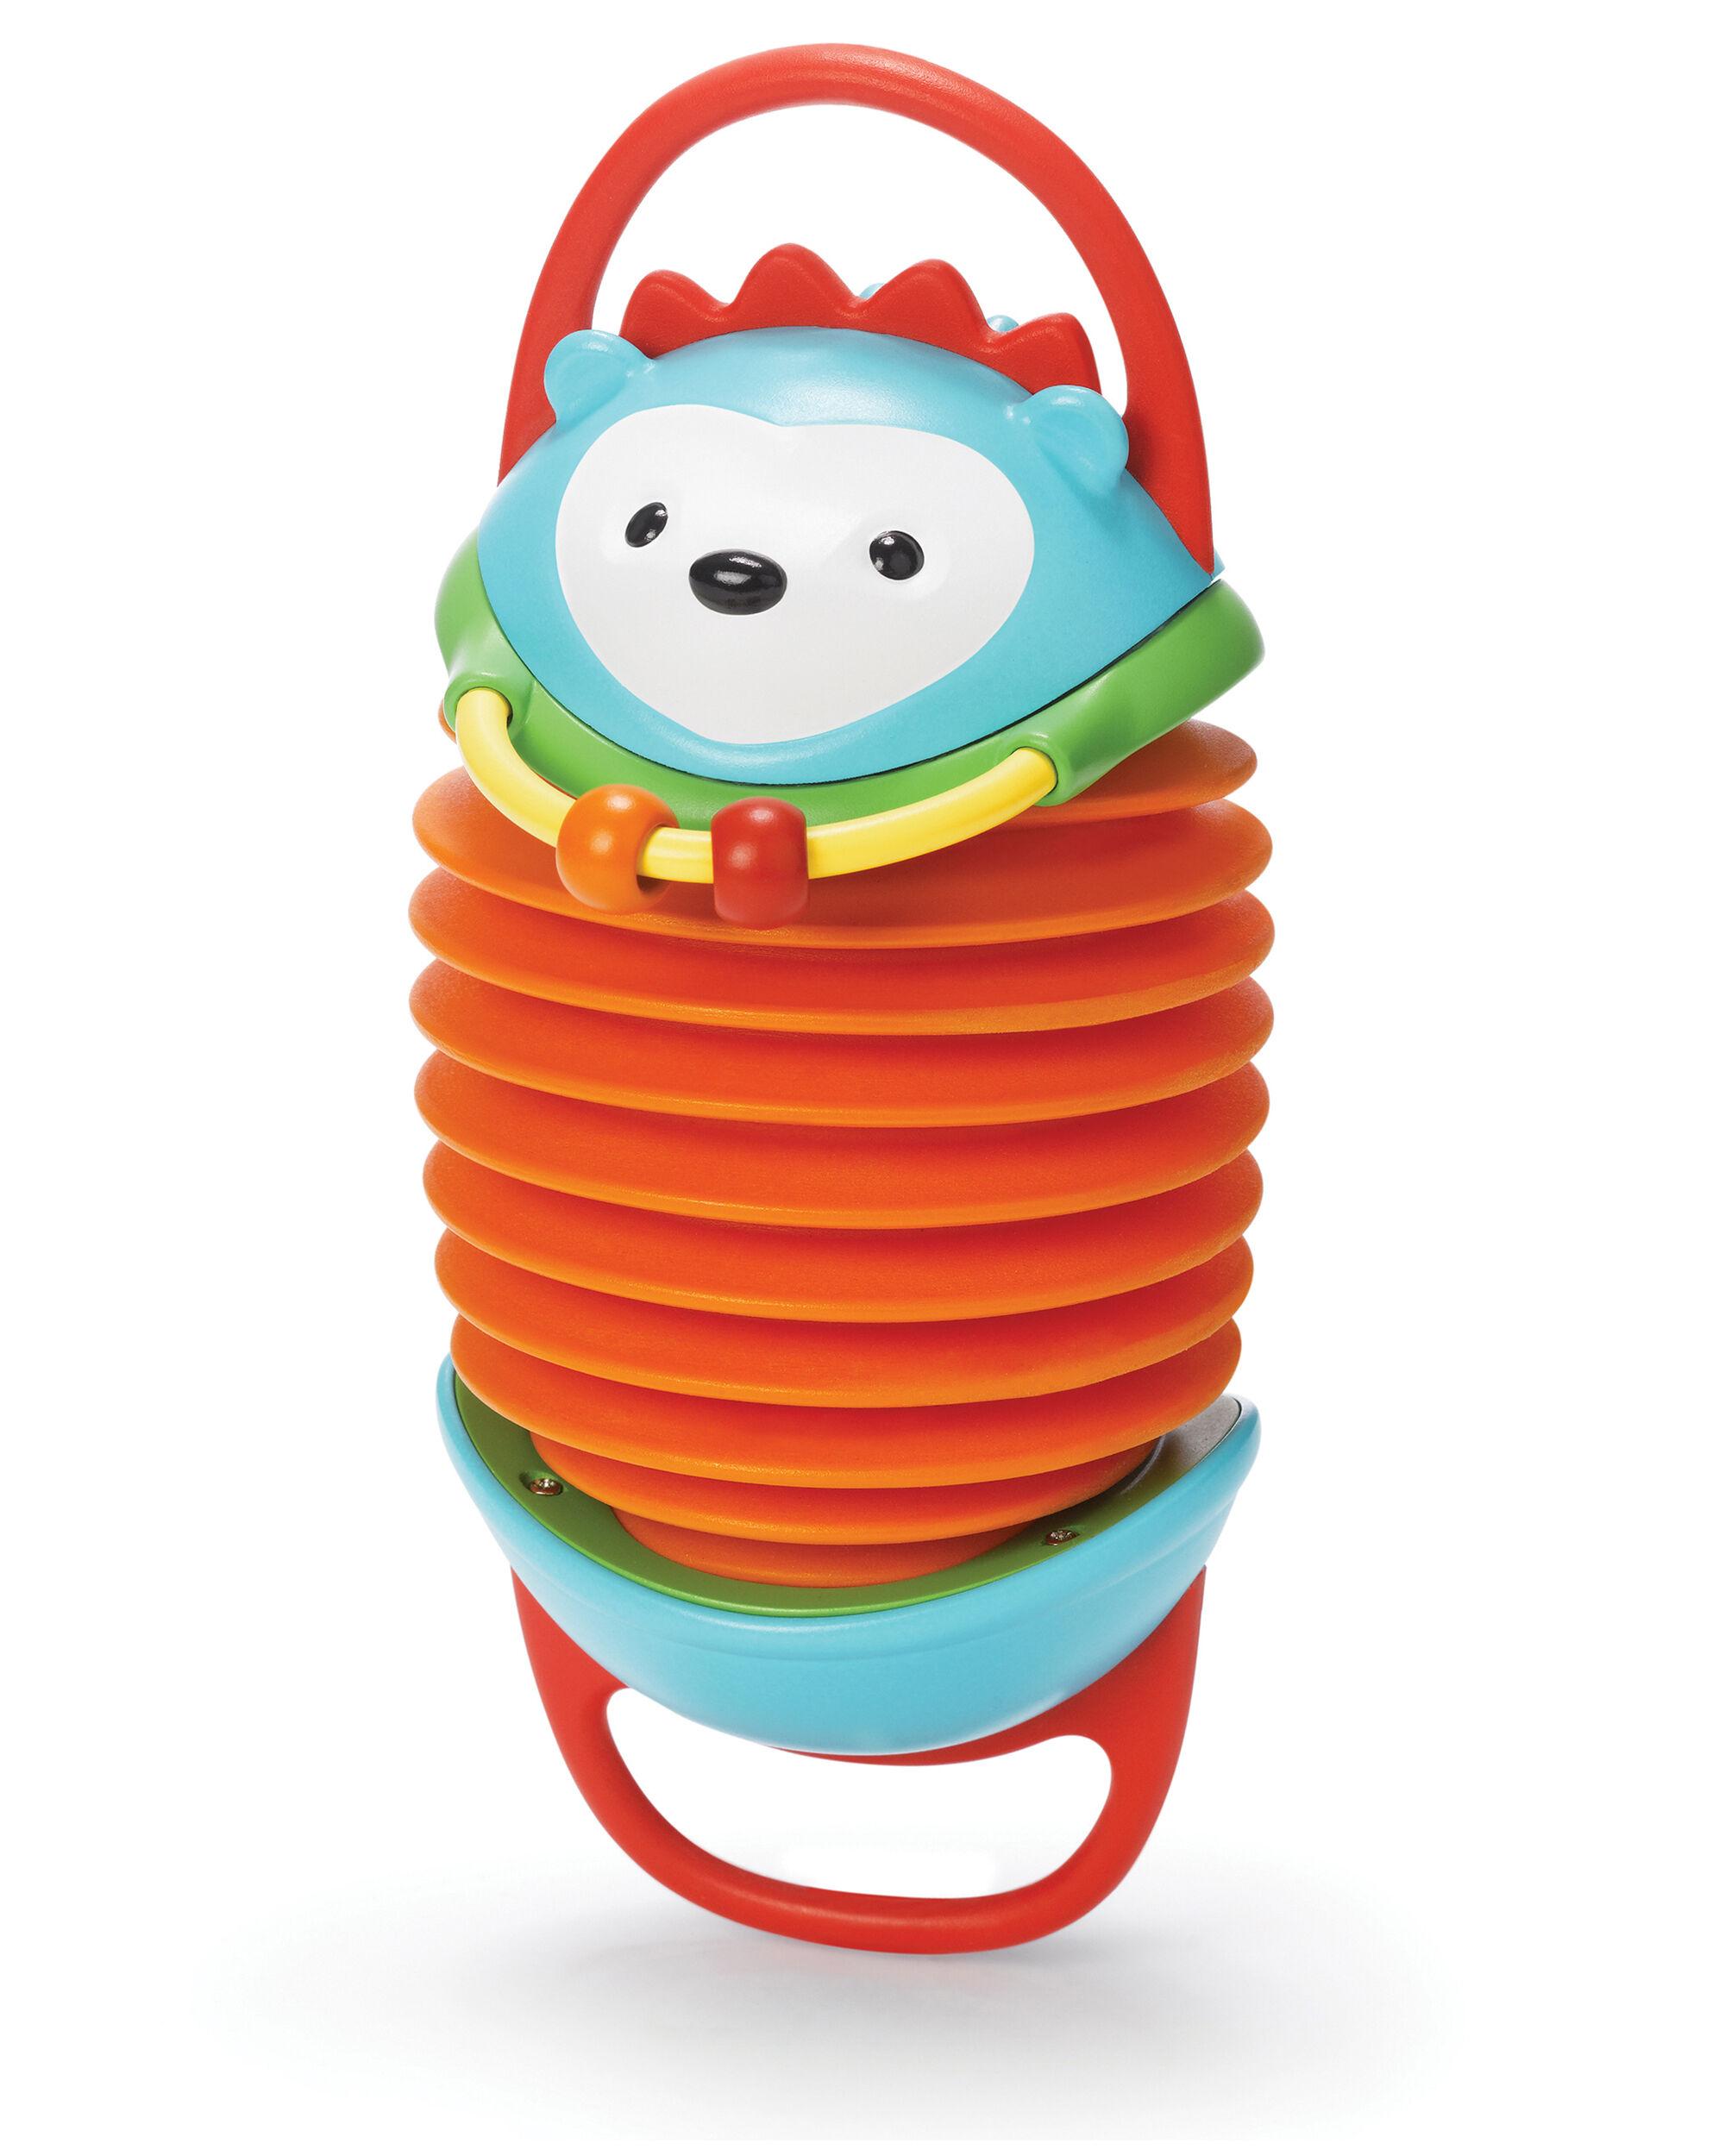 Carters Explore & More Hedgehog Accordion Toy